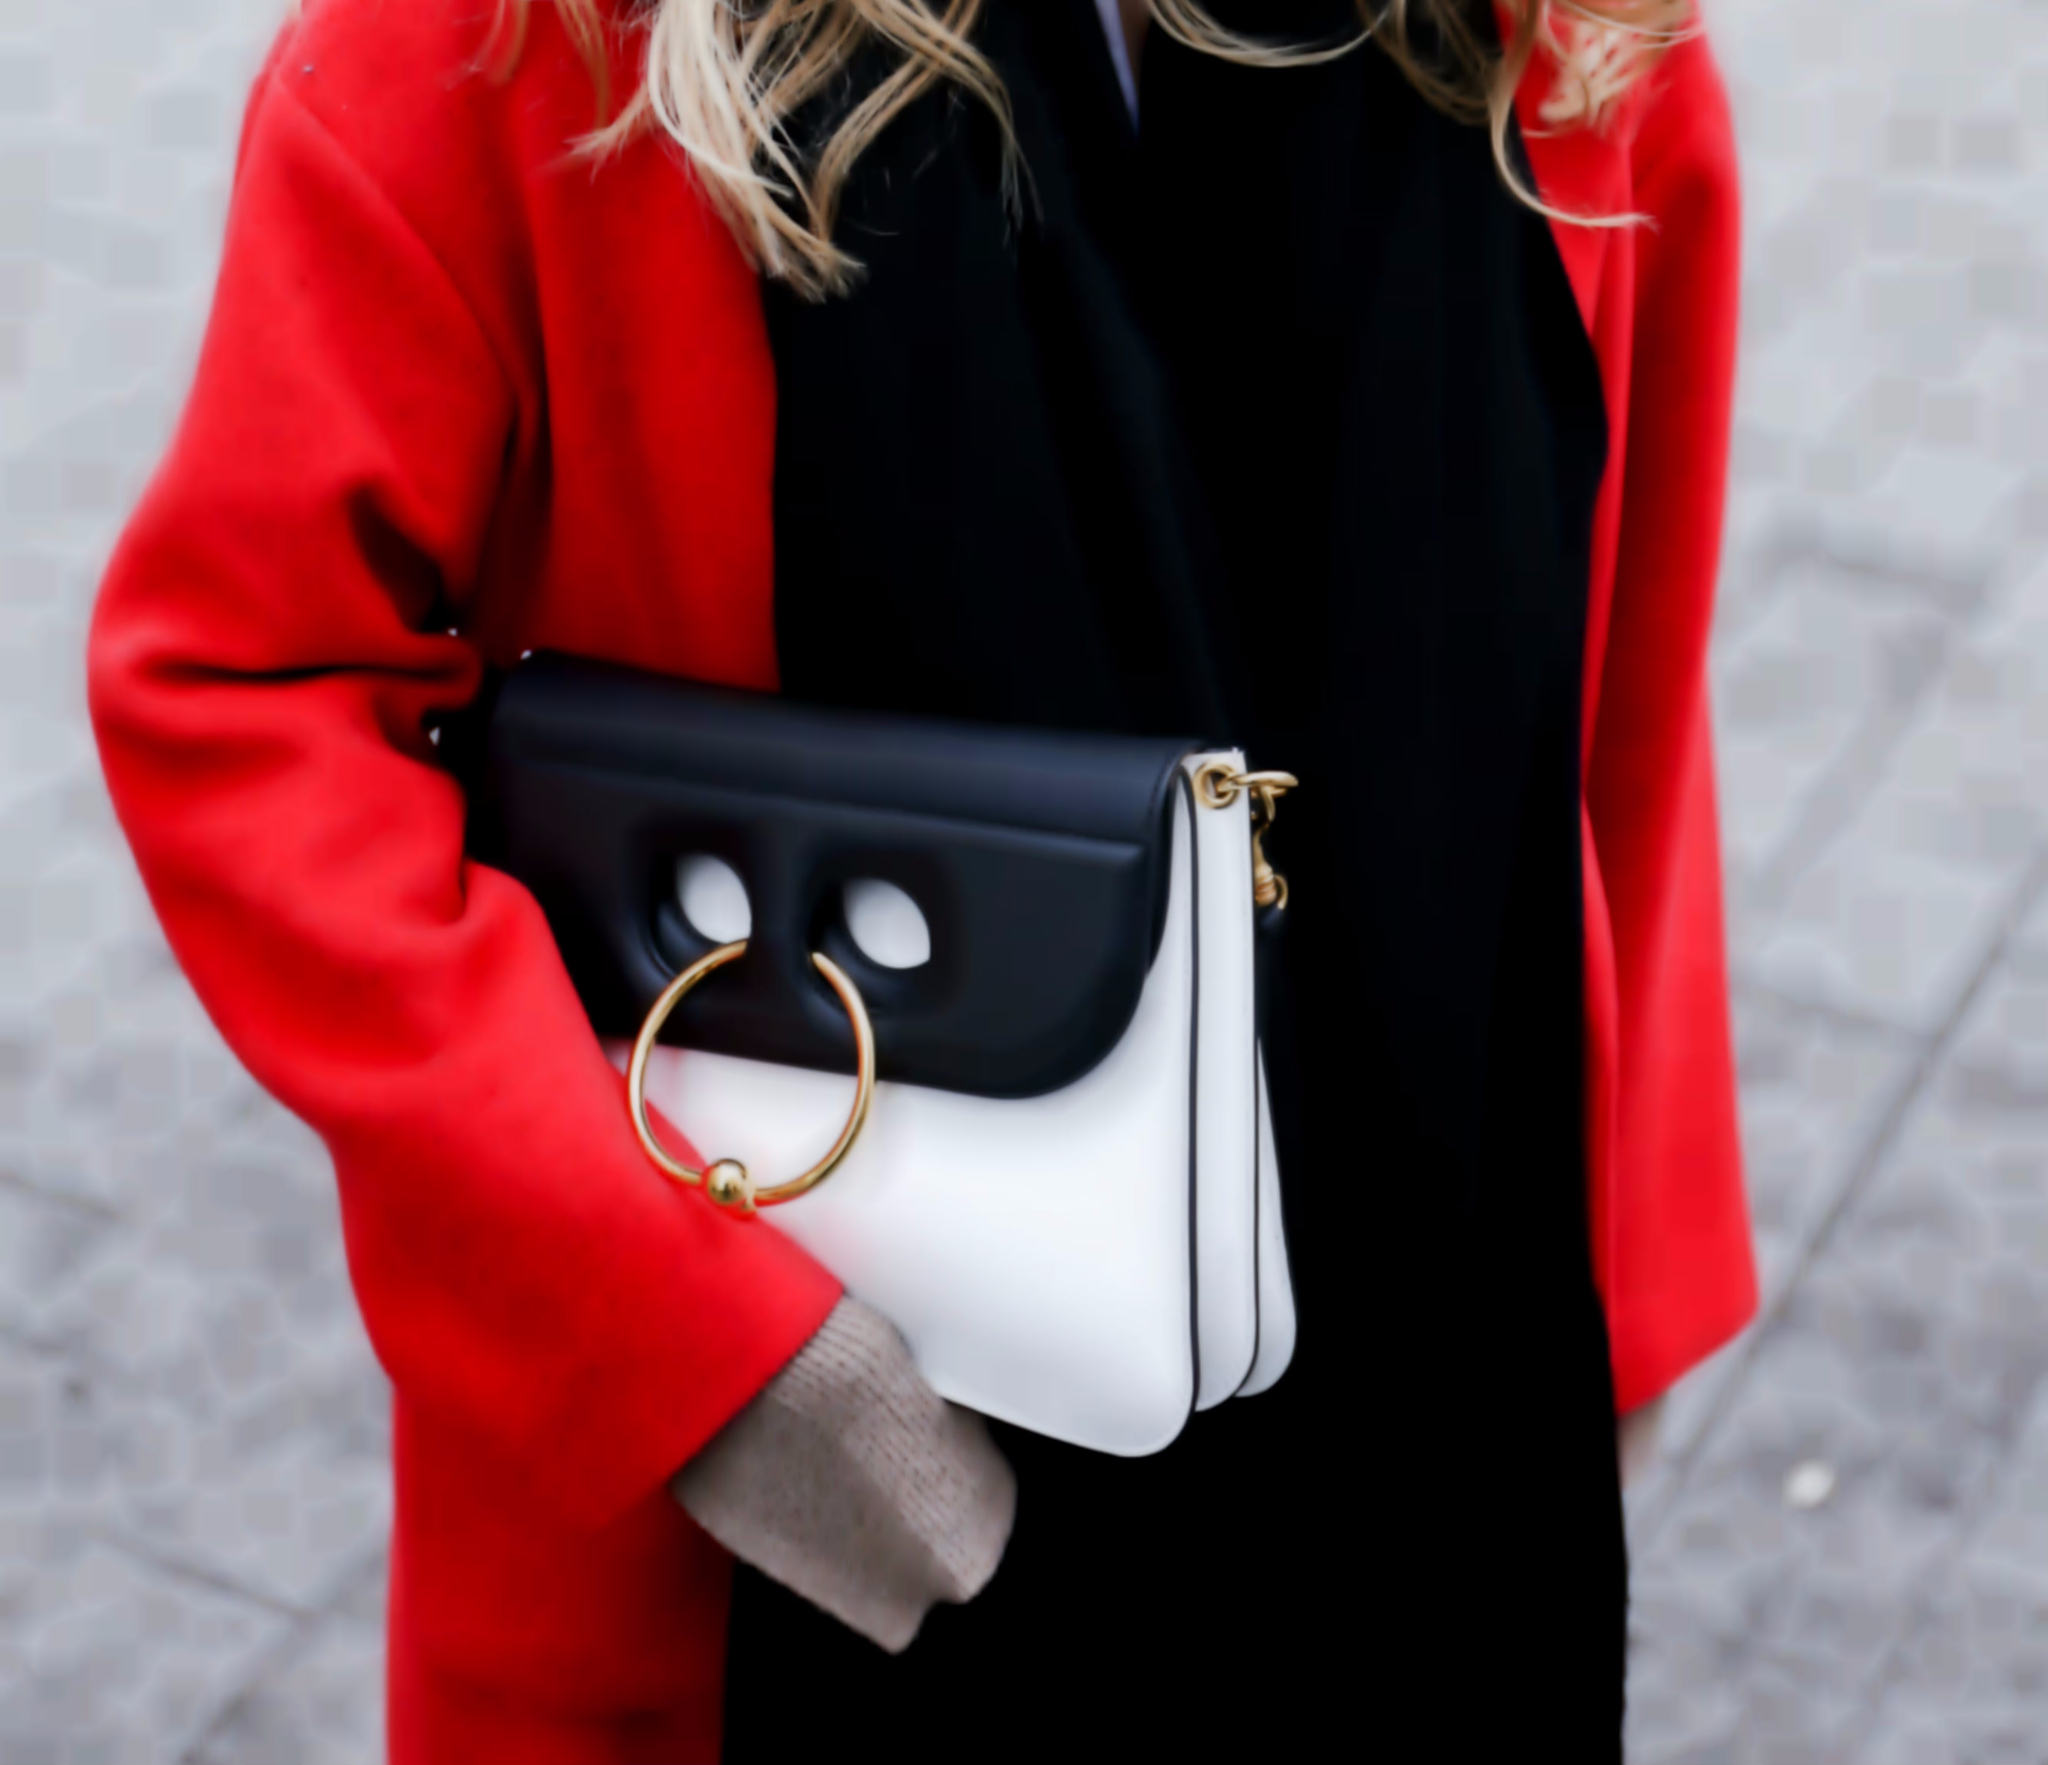 MOD-by-Monique-Fashion-Looks-MBFWB-Look-#2-20_22